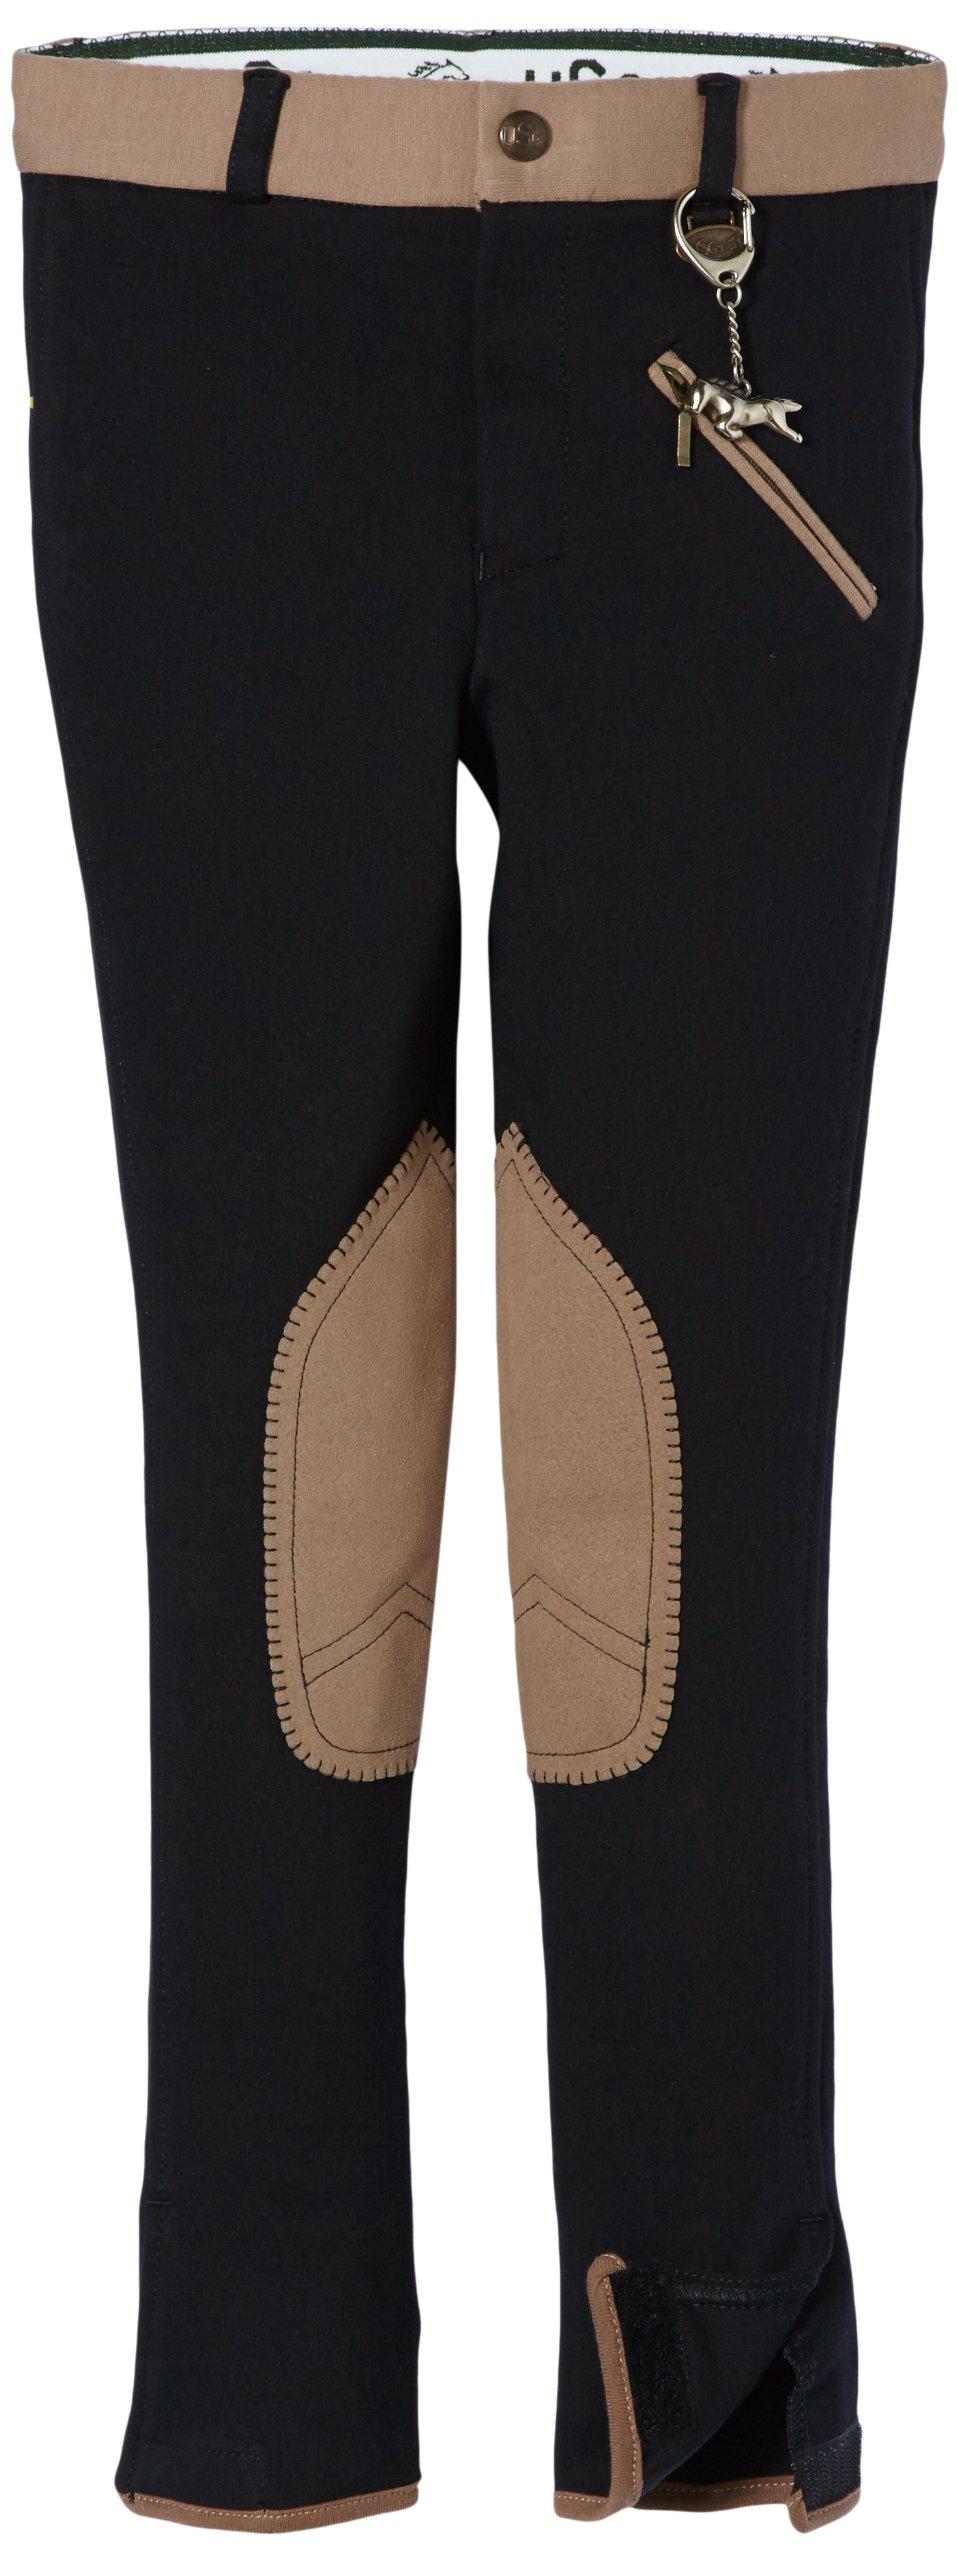 USG United Sportproducts, Pantaloni da cavallerizzo Bambino Emilia, Nero (Schwarz/Camel), 152 cm